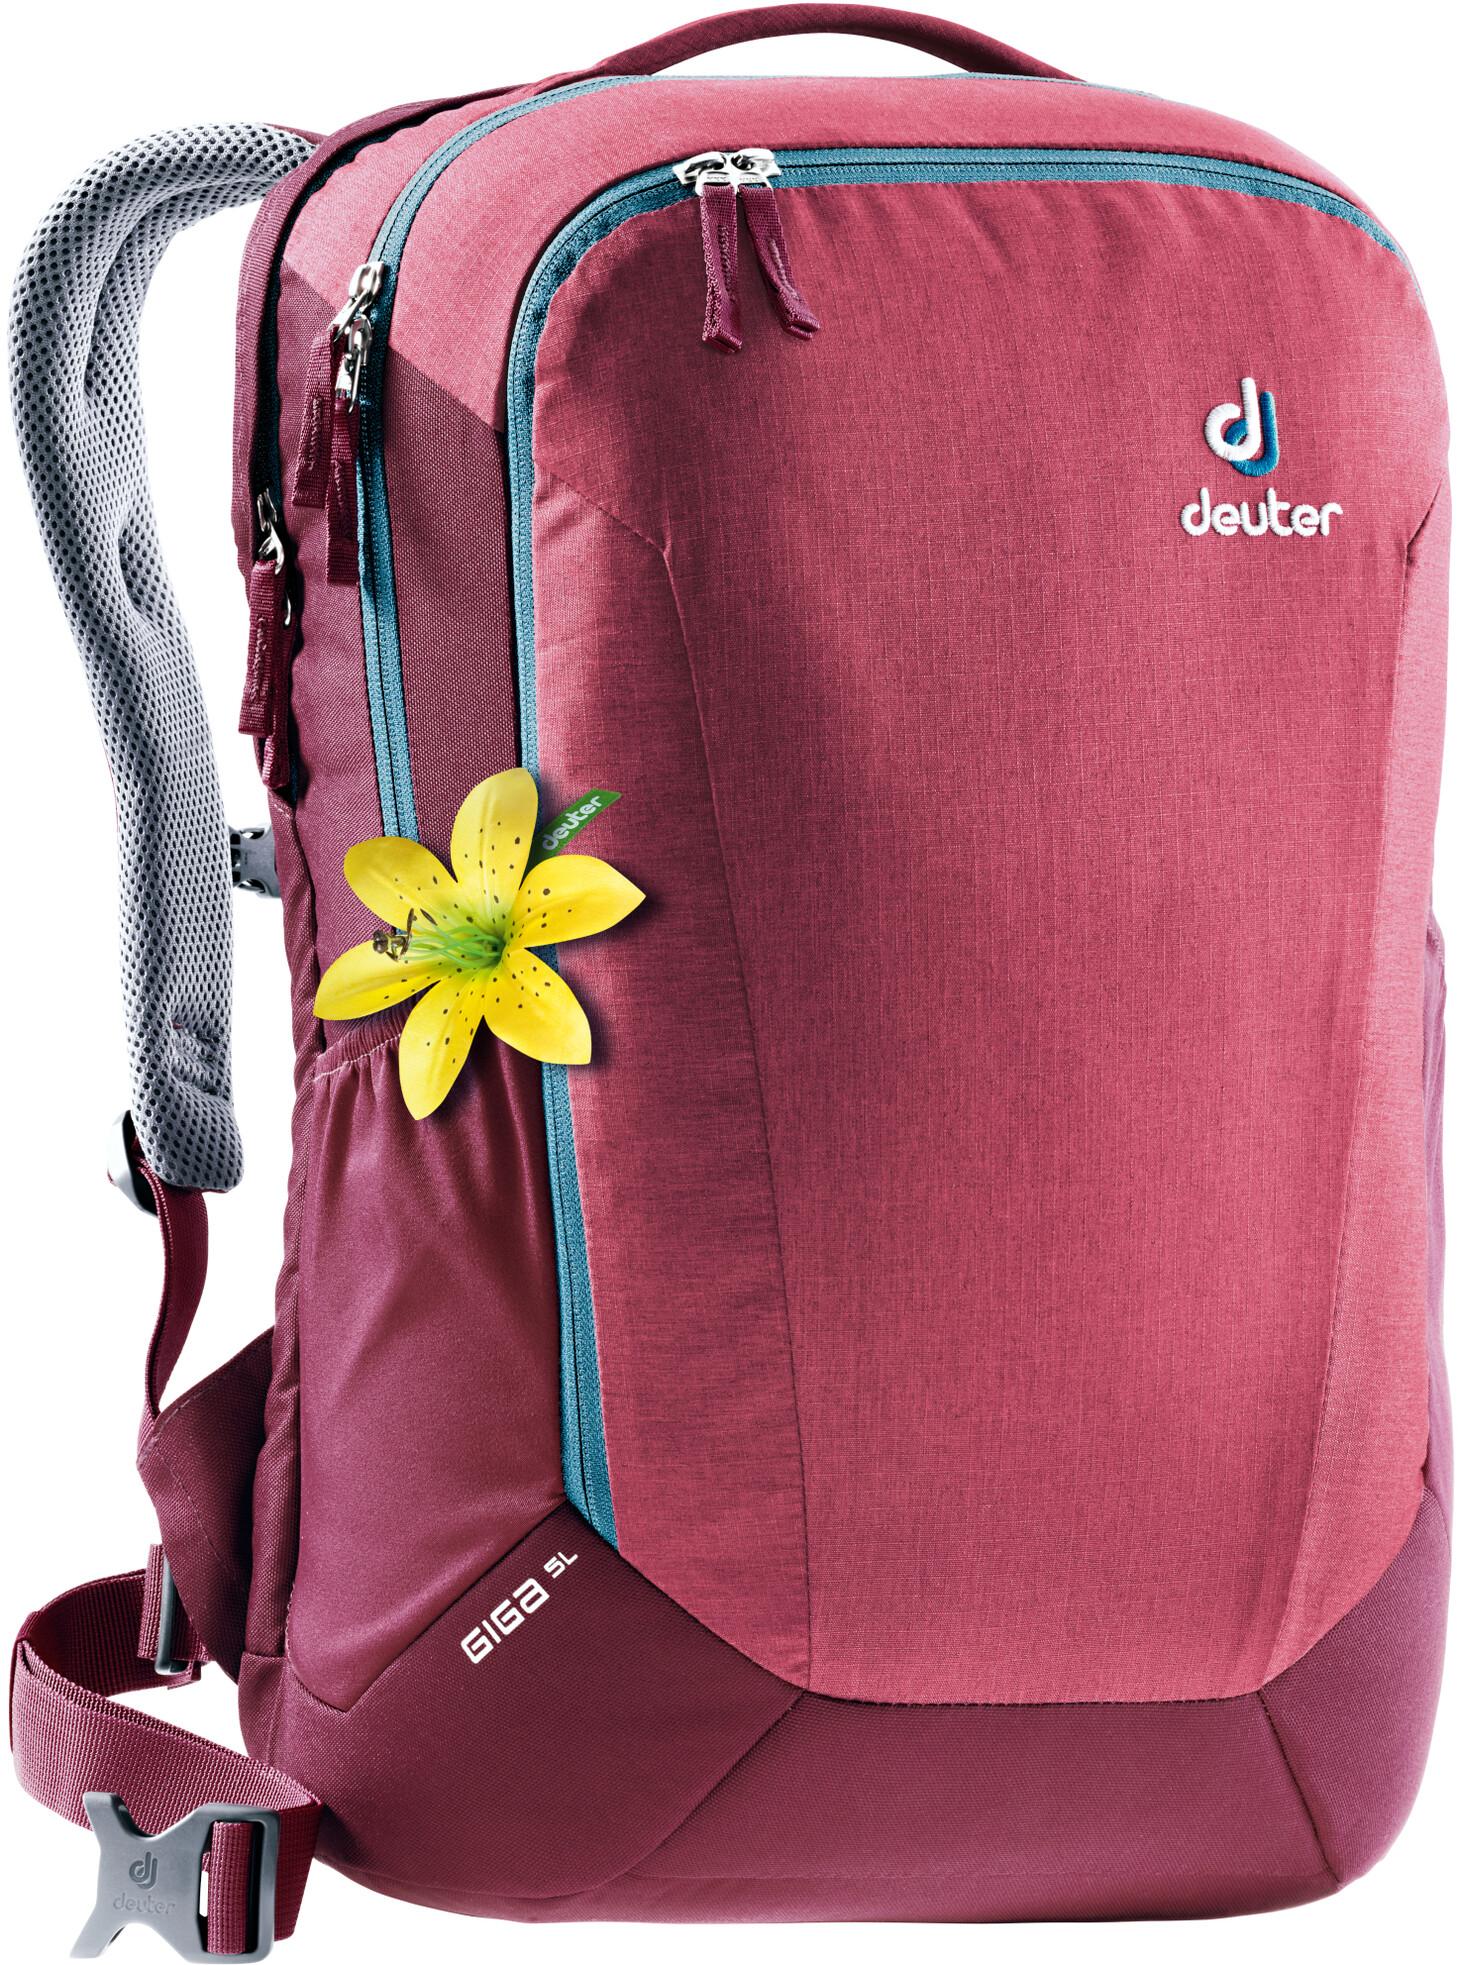 Deuter Giga SL Rygsæk 28L Damer, cardinal-maron (2019)   Travel bags